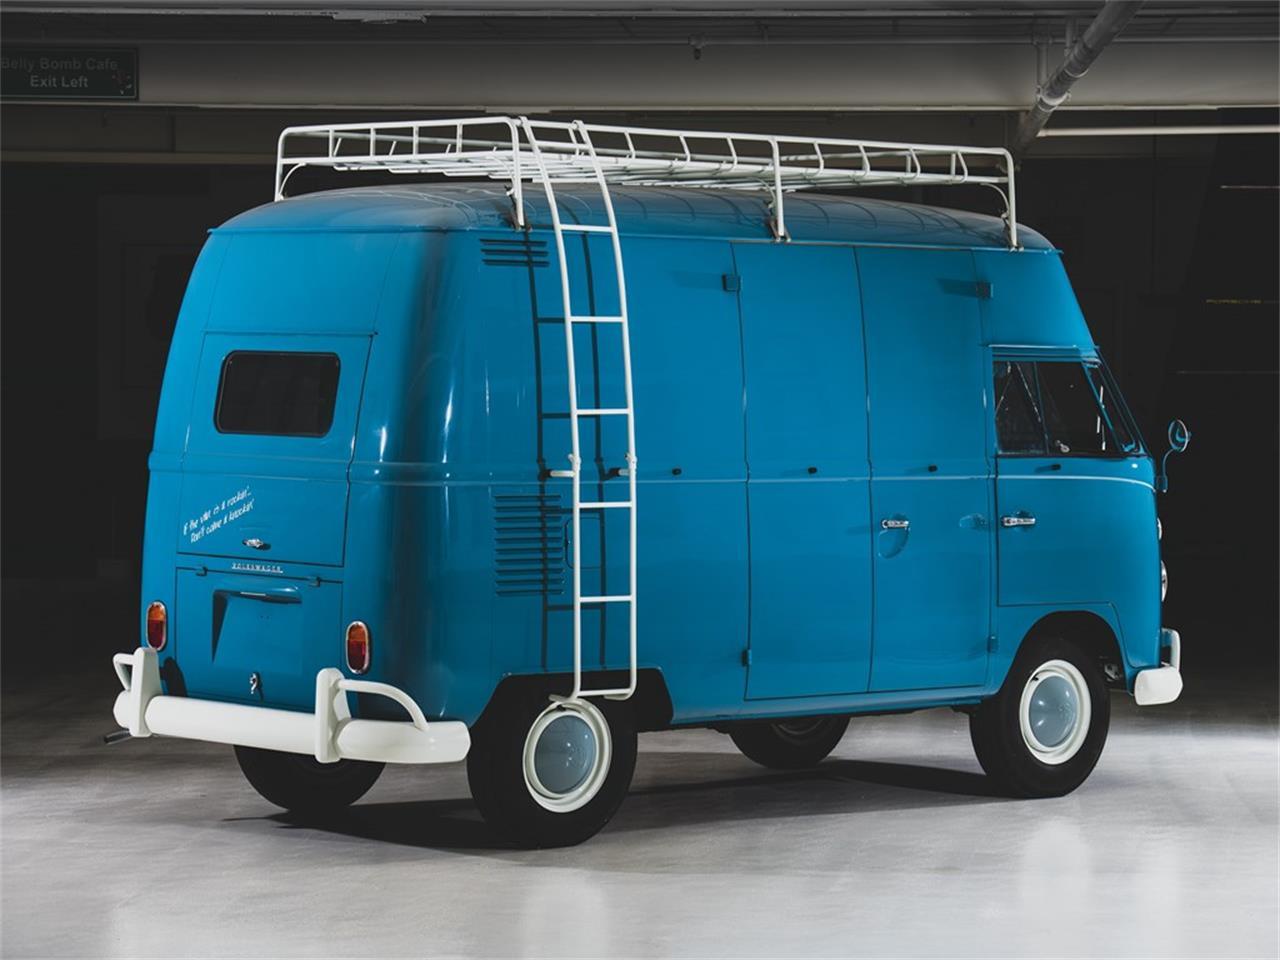 1967 Volkswagen Type 2 (CC-1255600) for sale in Dayton, Ohio